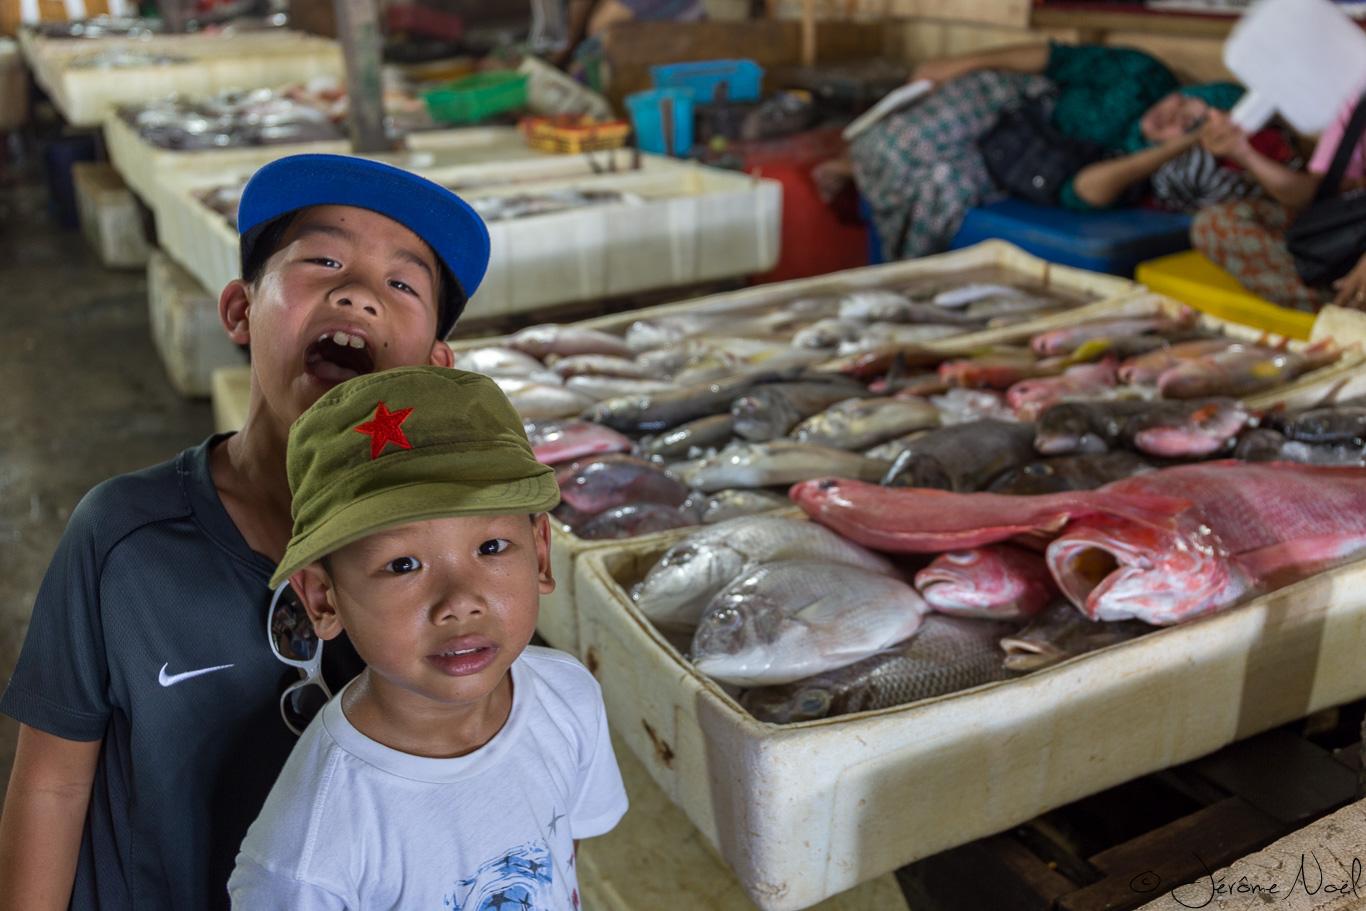 Jimbaran Fish Market - Bouches ouvertes